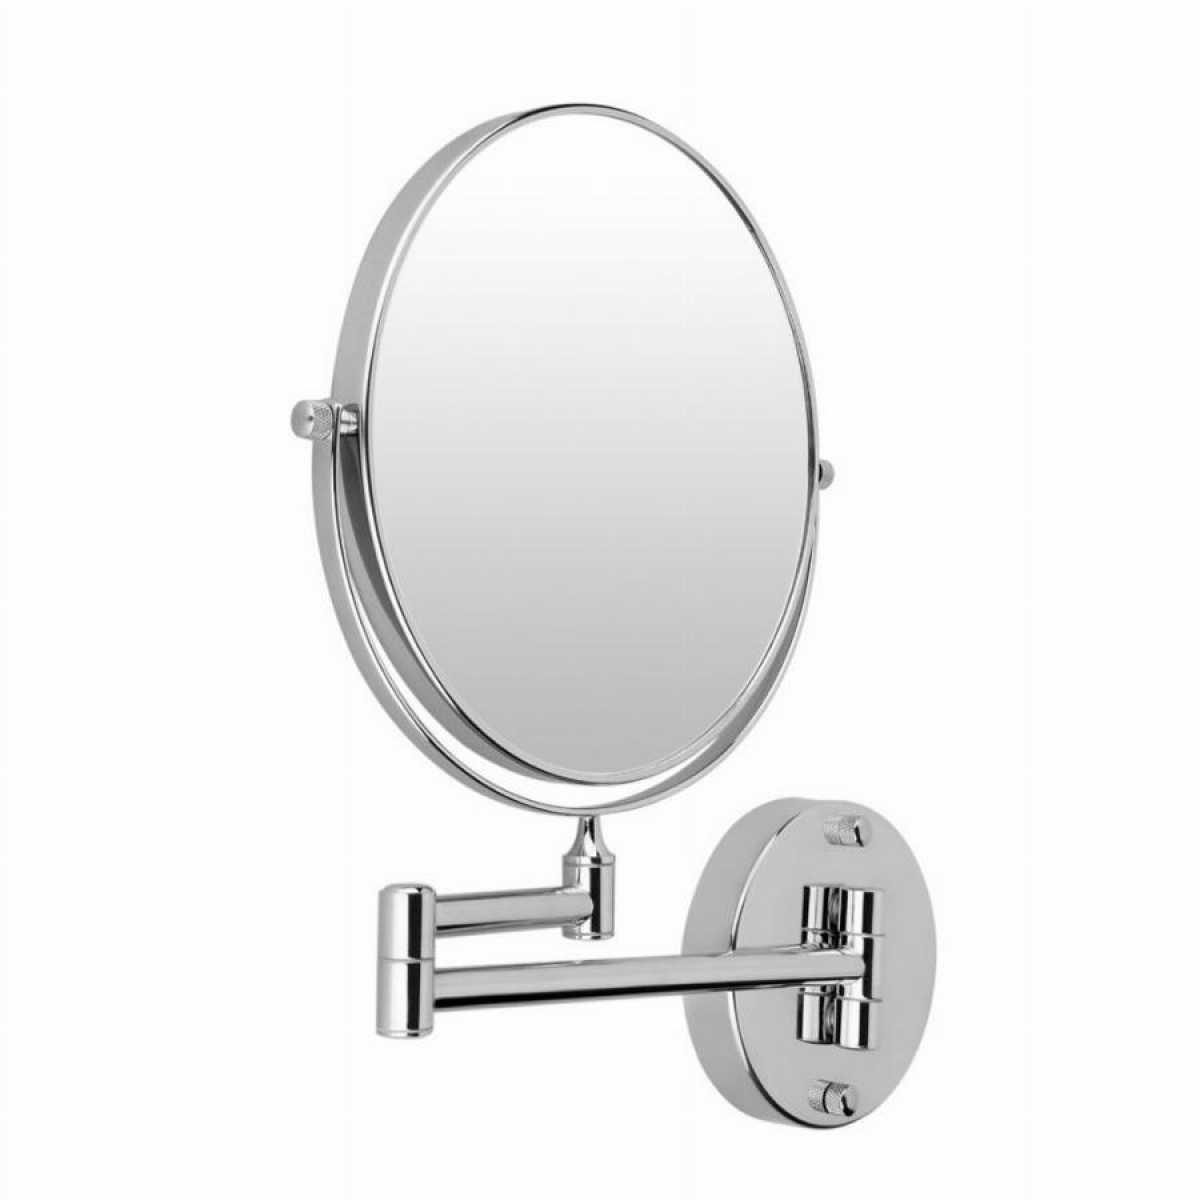 Duvara Monte Makyaj Aynası, Çift Taraflı